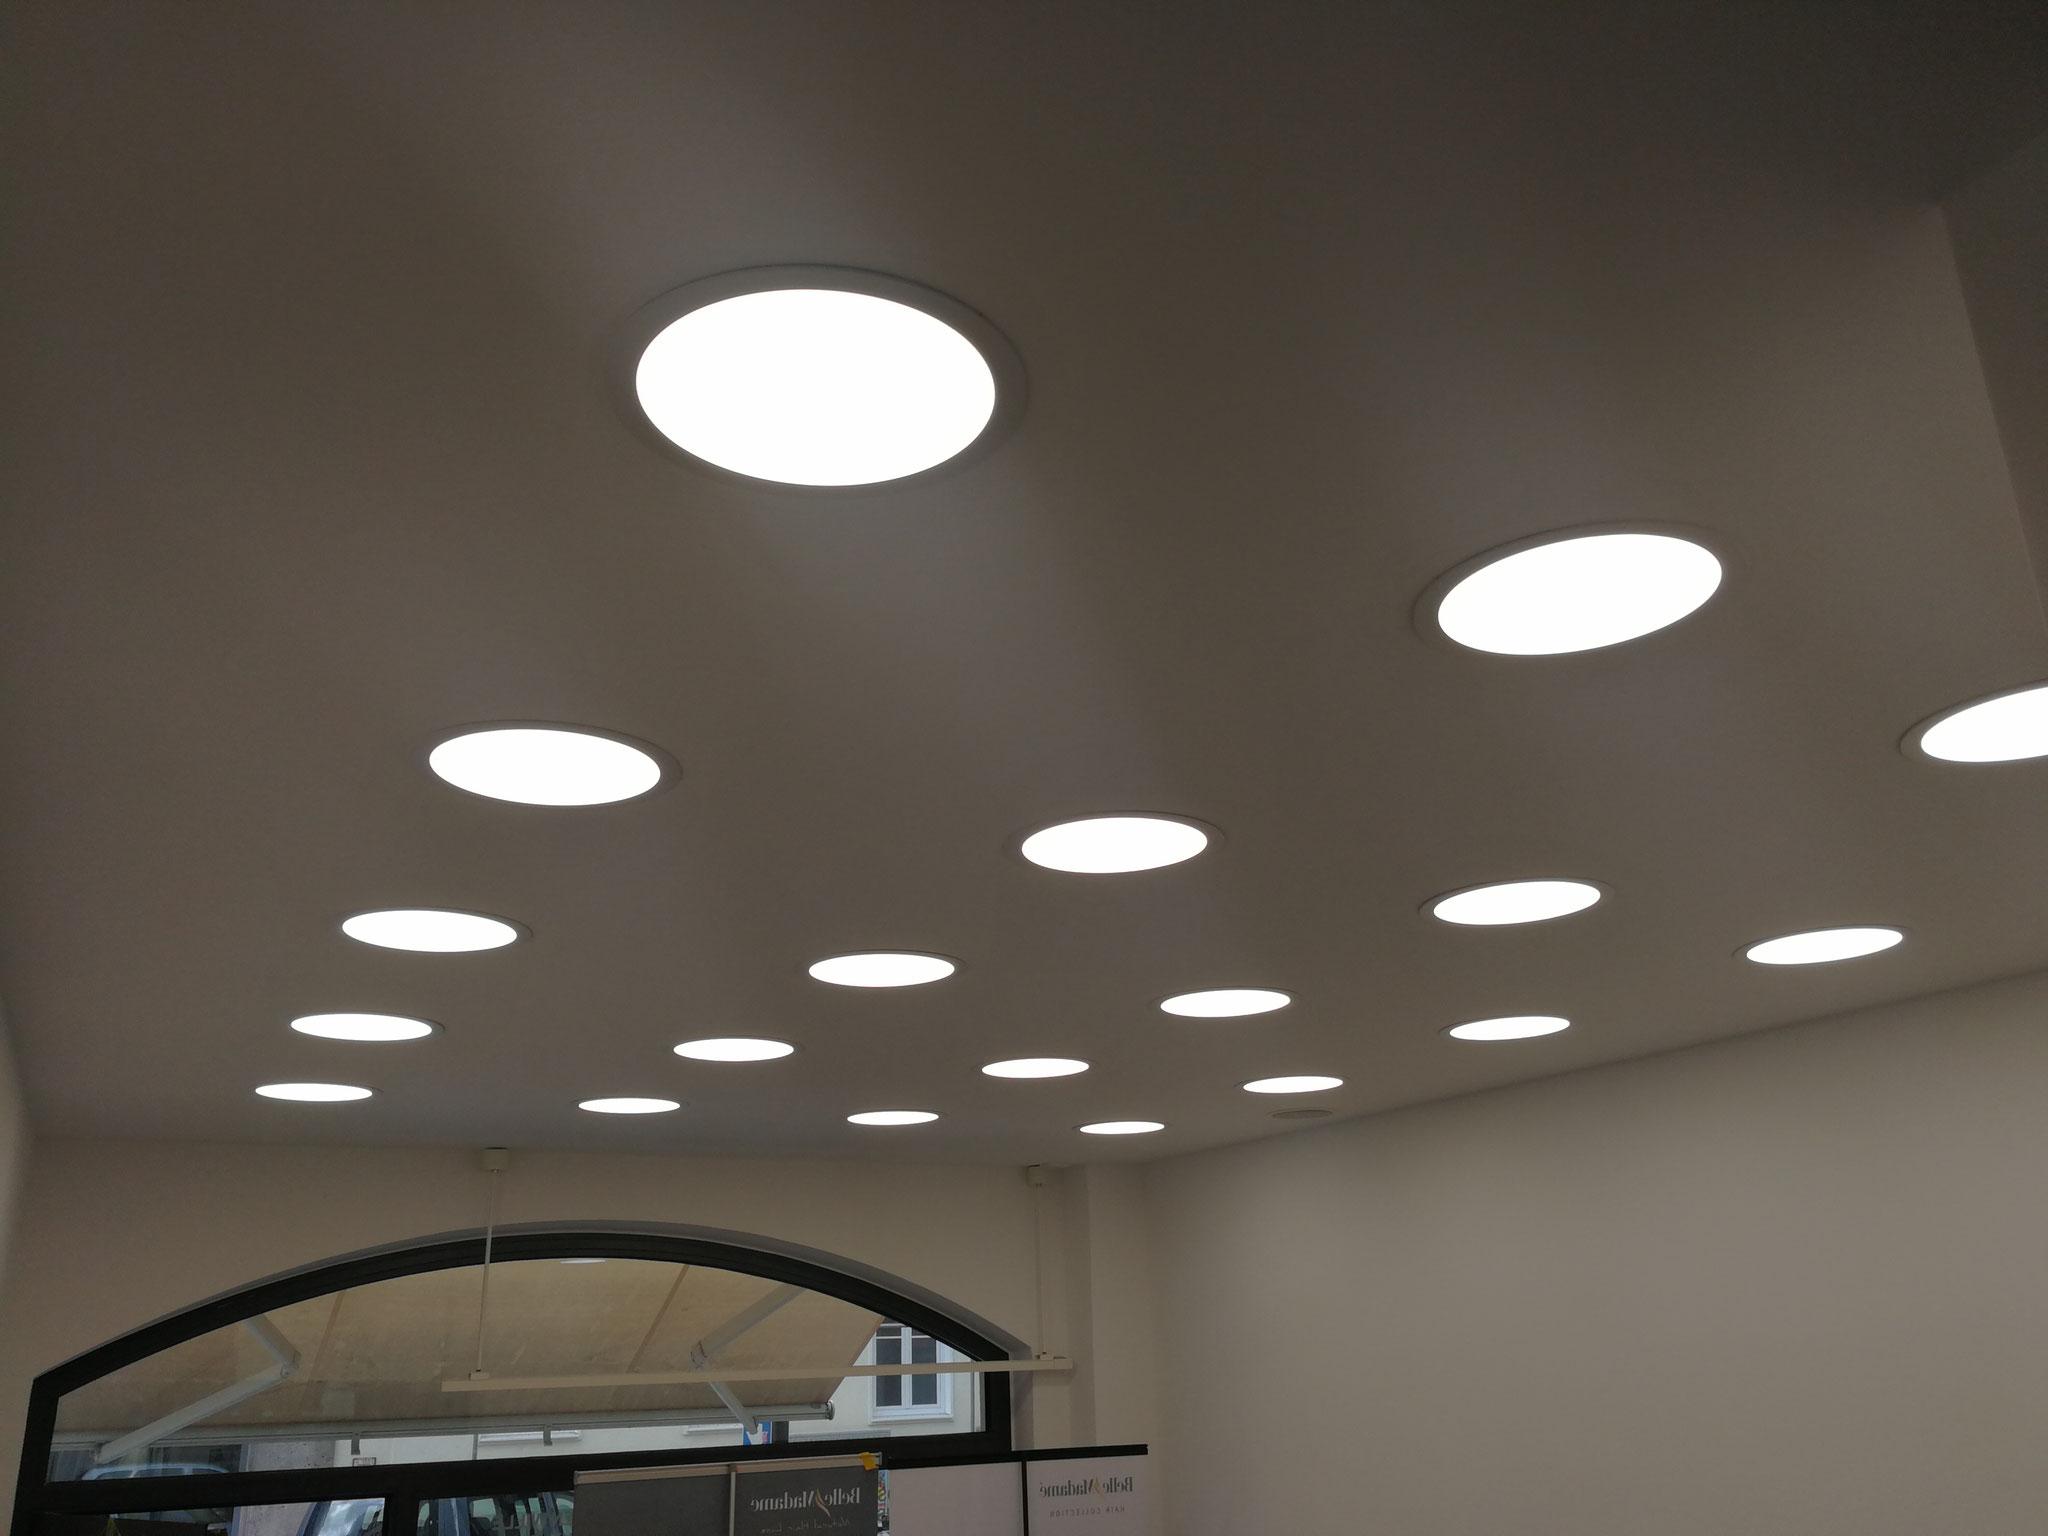 LED Beleuchtung 24 W neutralweiß